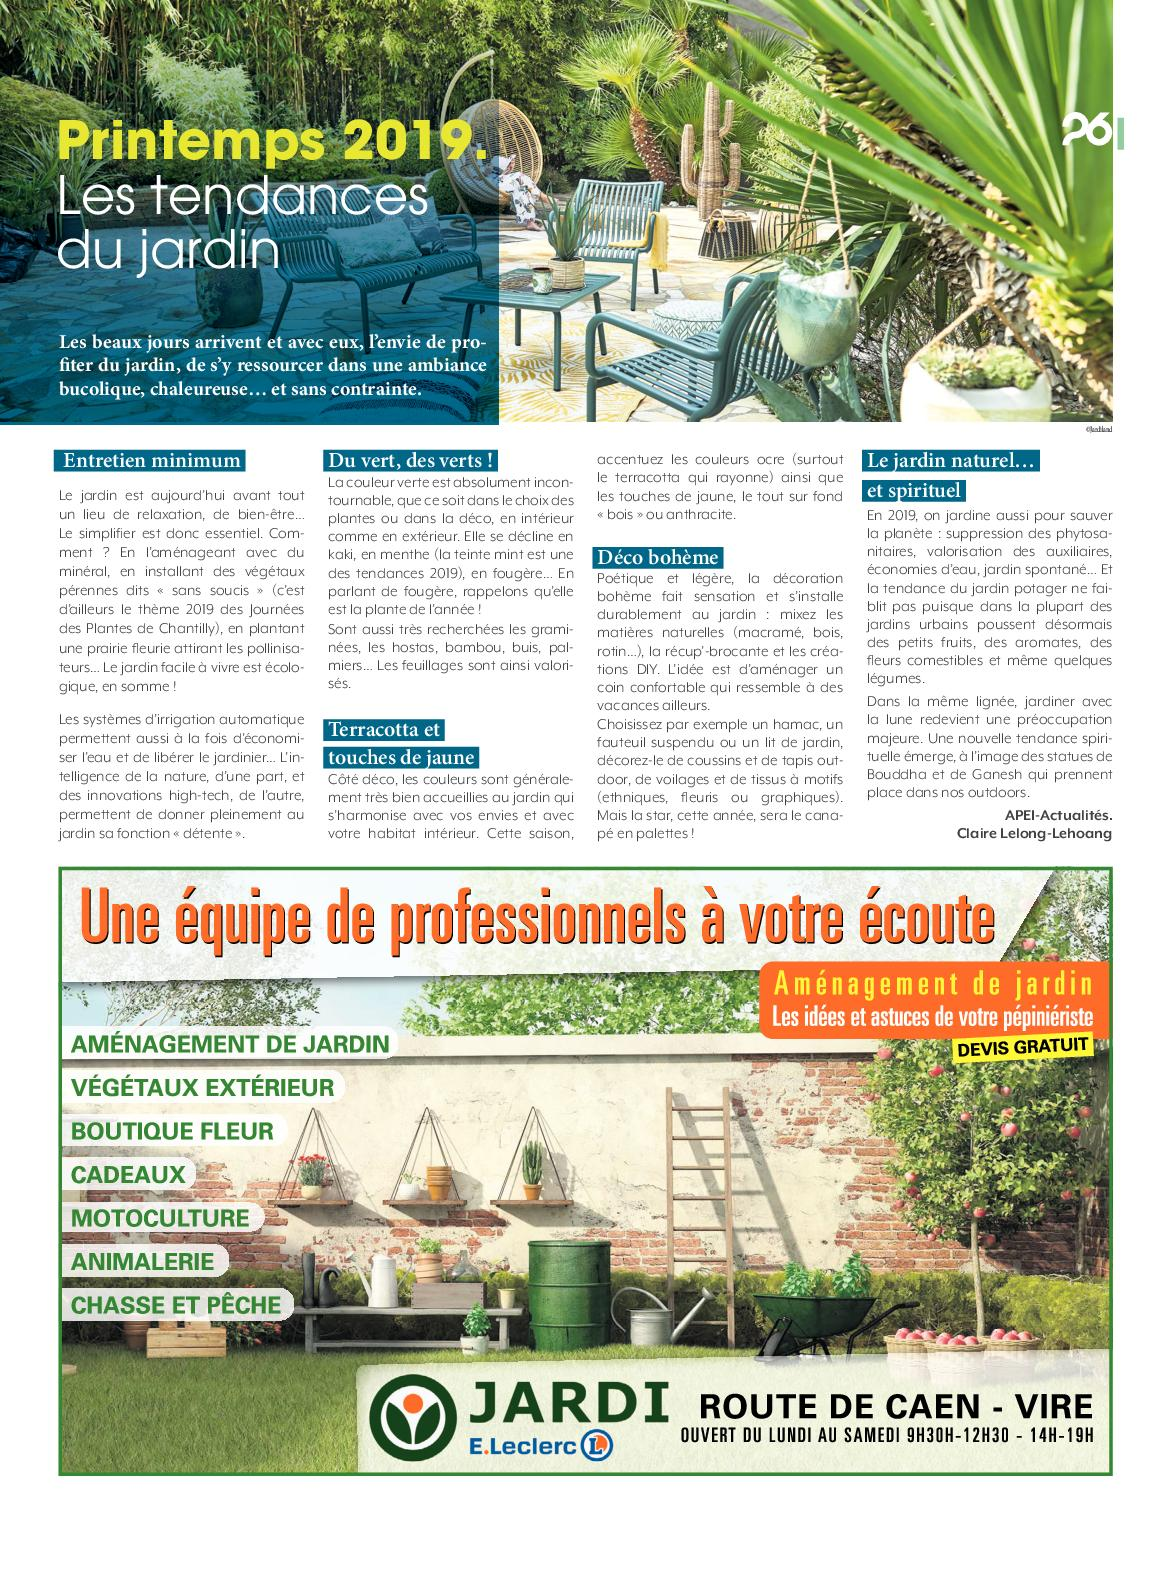 Idee Amenagement Jardin Élégant Habitat Oc Mars 2019 Calameo Downloader Of 57 Frais Idee Amenagement Jardin